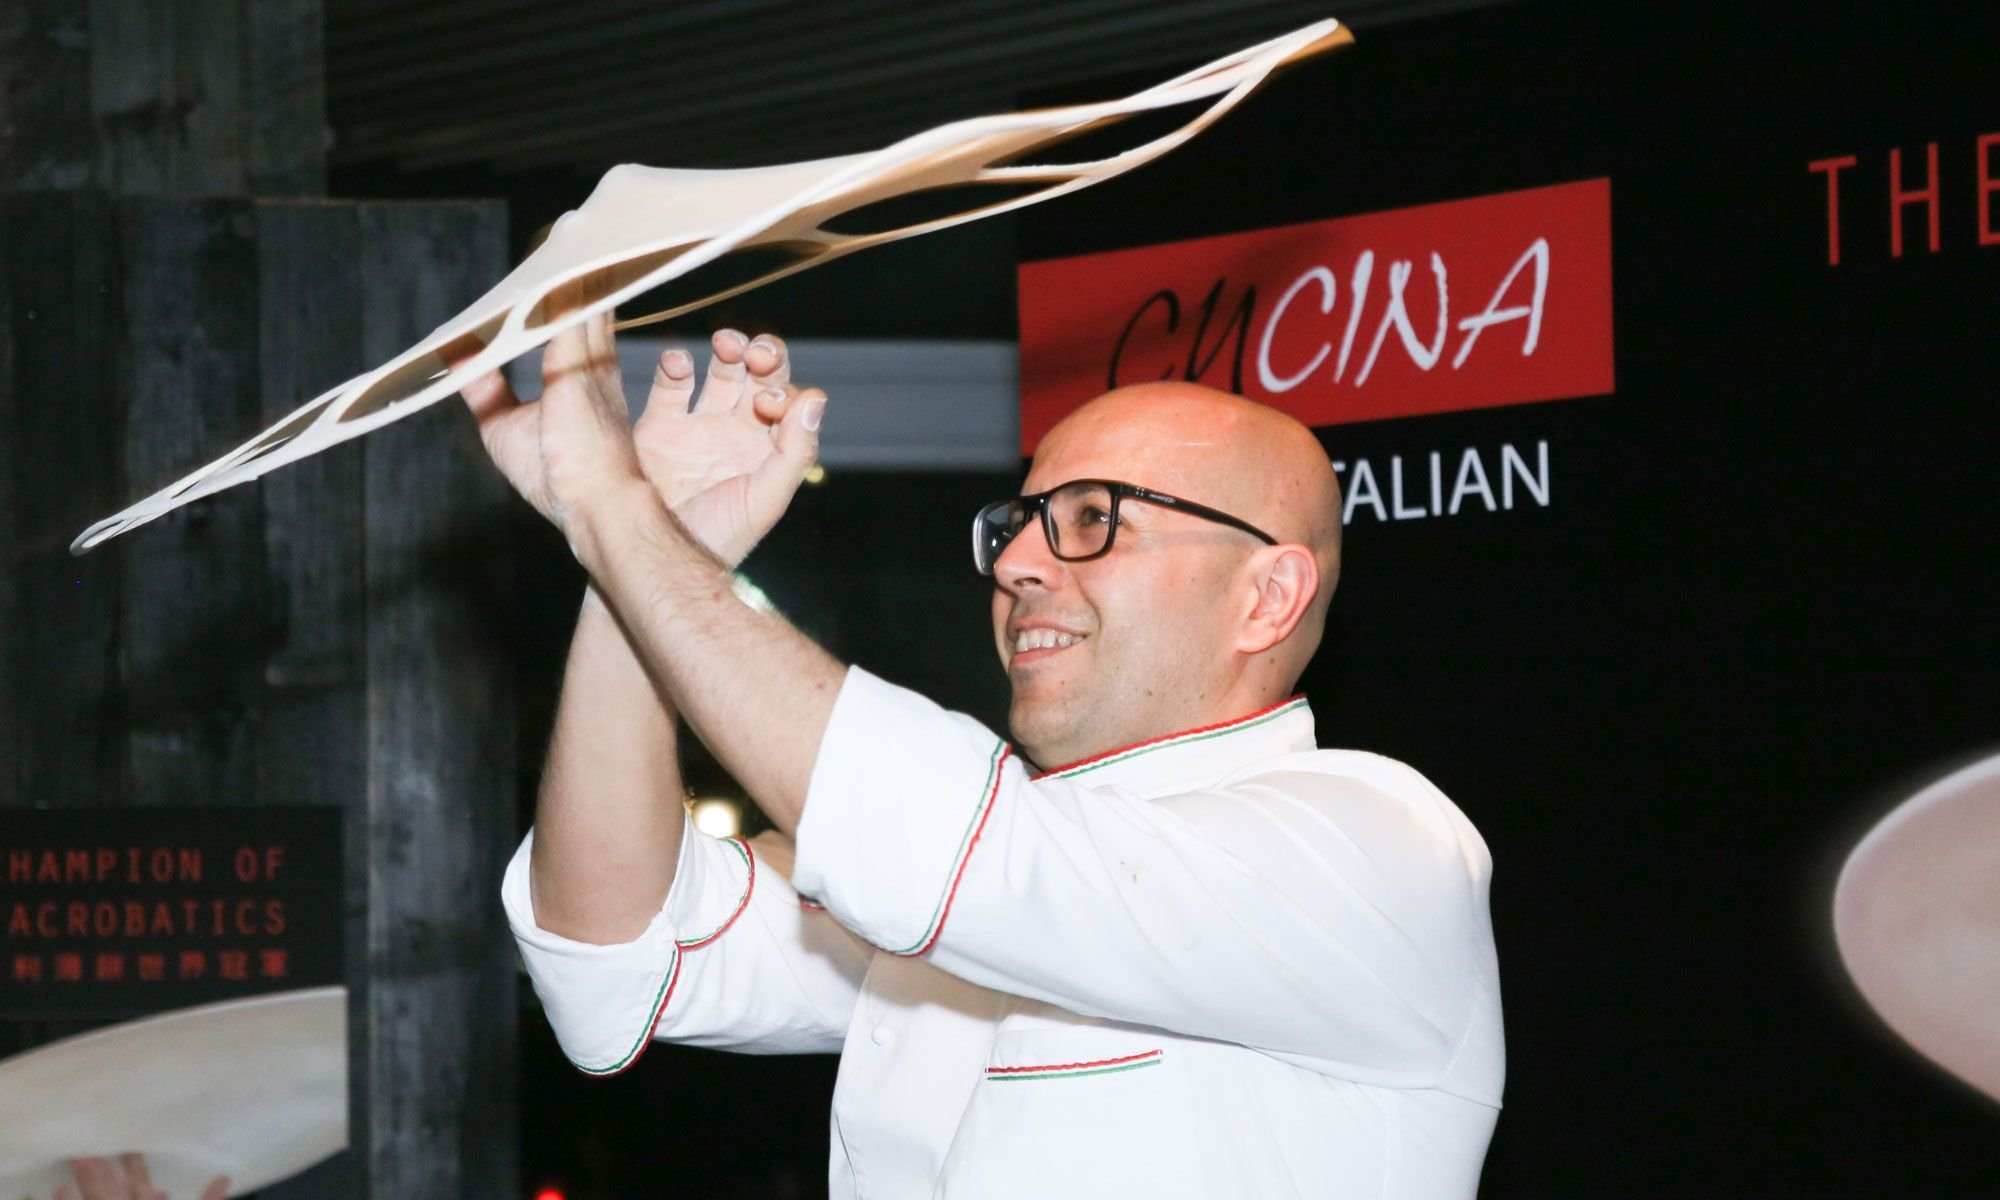 World Champion Of Pizza Acrobatics At Cucina